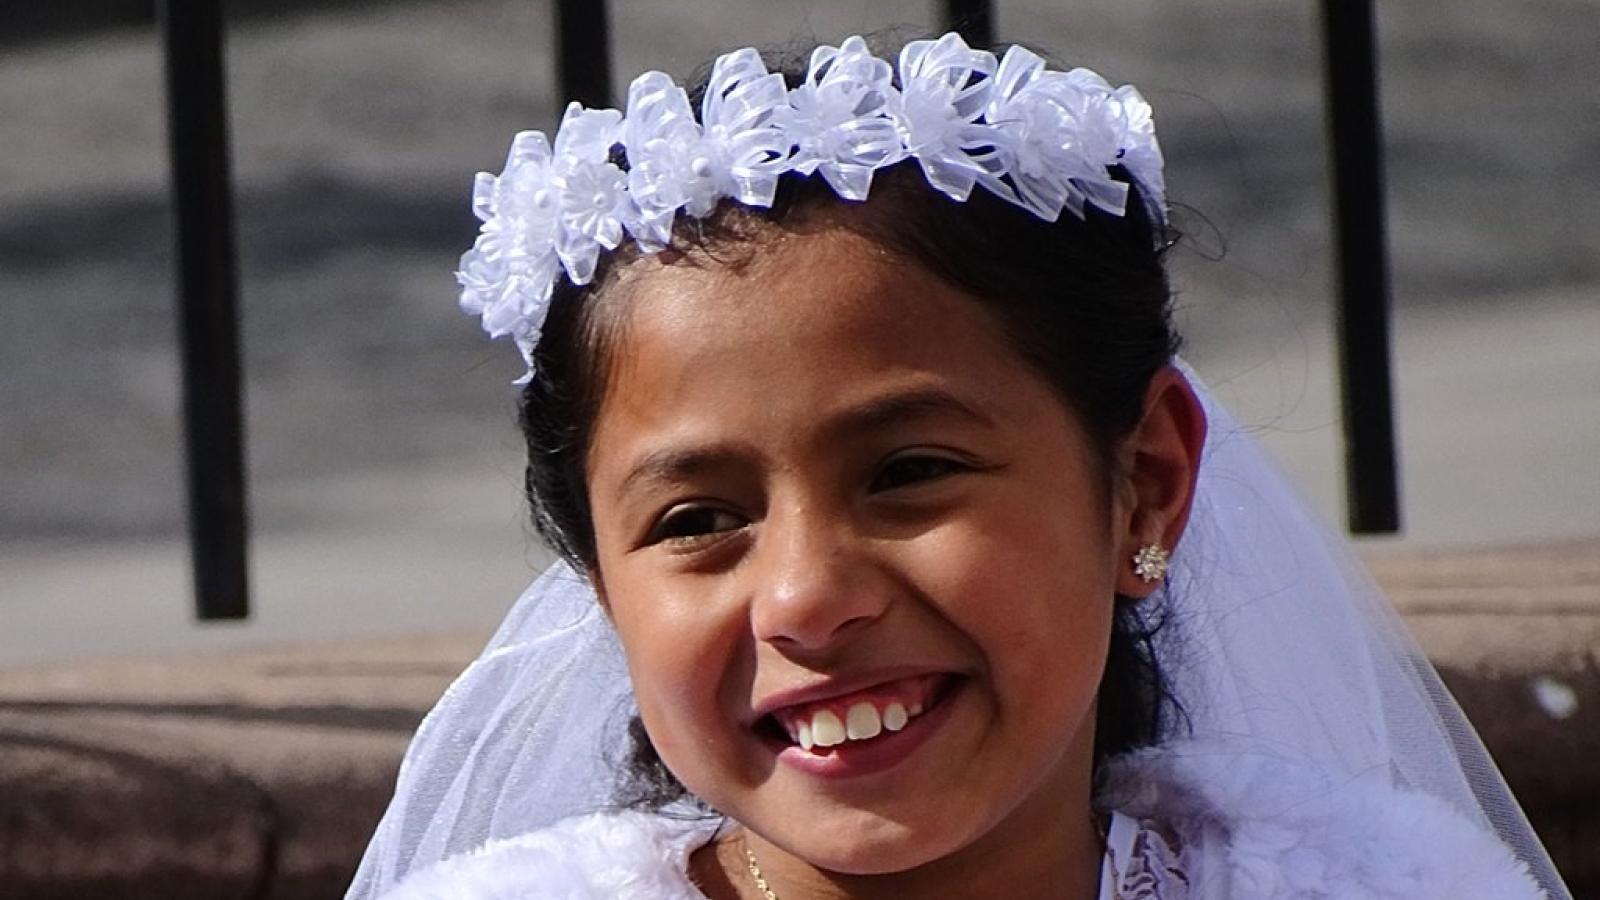 Girl in Communion Dress